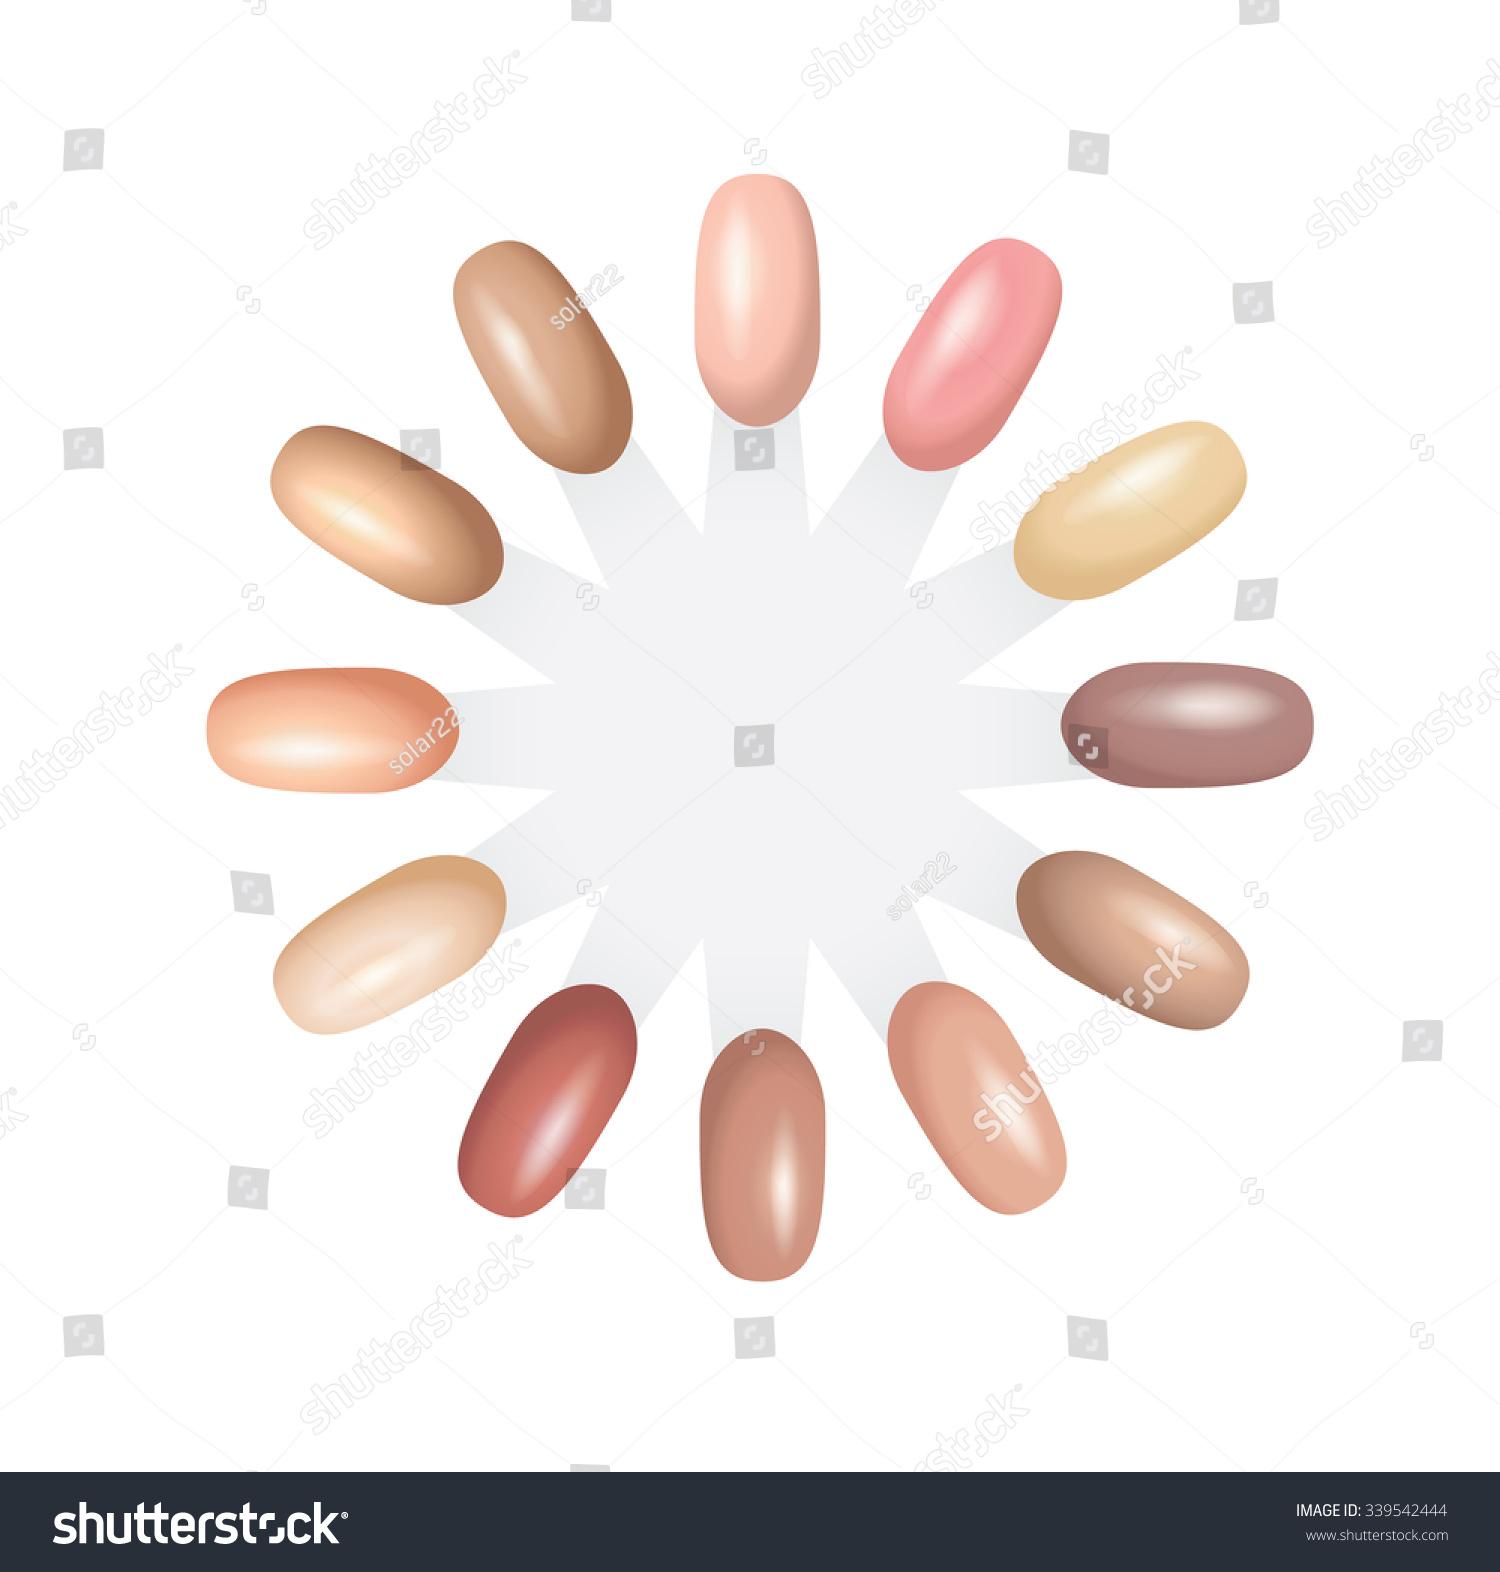 Nail Polish Nude Color Chart Tone Stock Vector 339542444 - Shutterstock